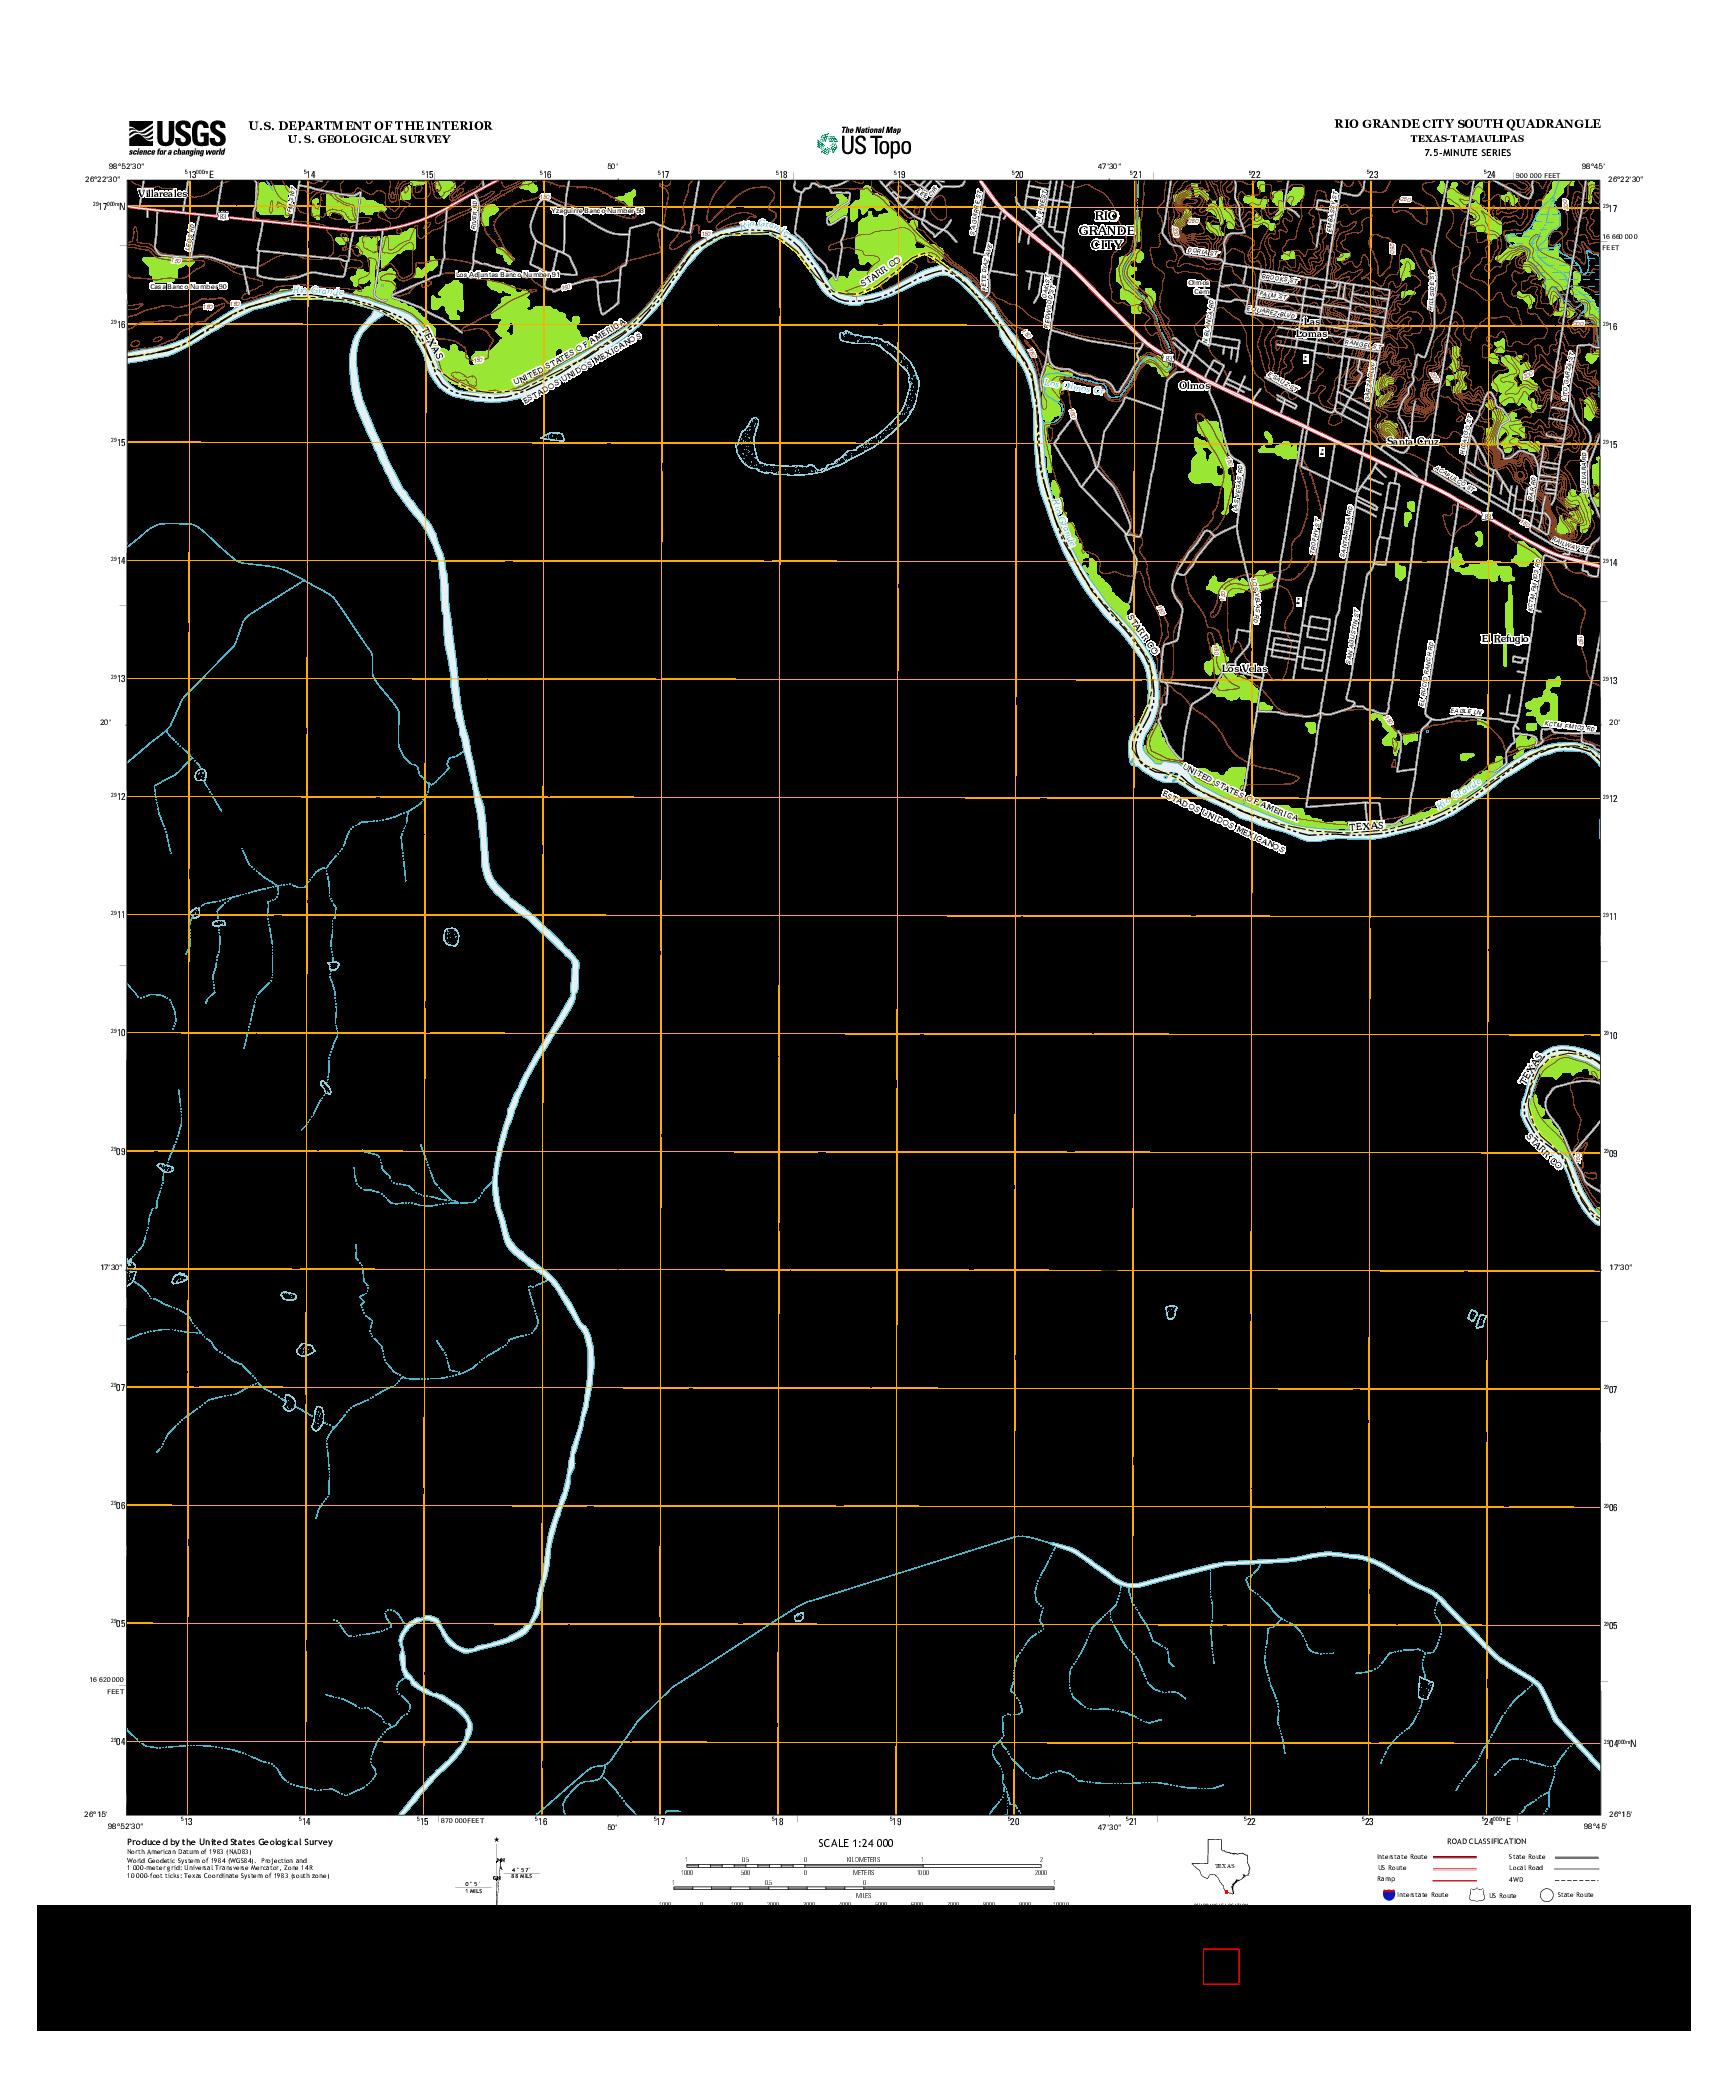 USGS US TOPO 7.5-MINUTE MAP FOR RIO GRANDE CITY SOUTH, TX-TAM 2013